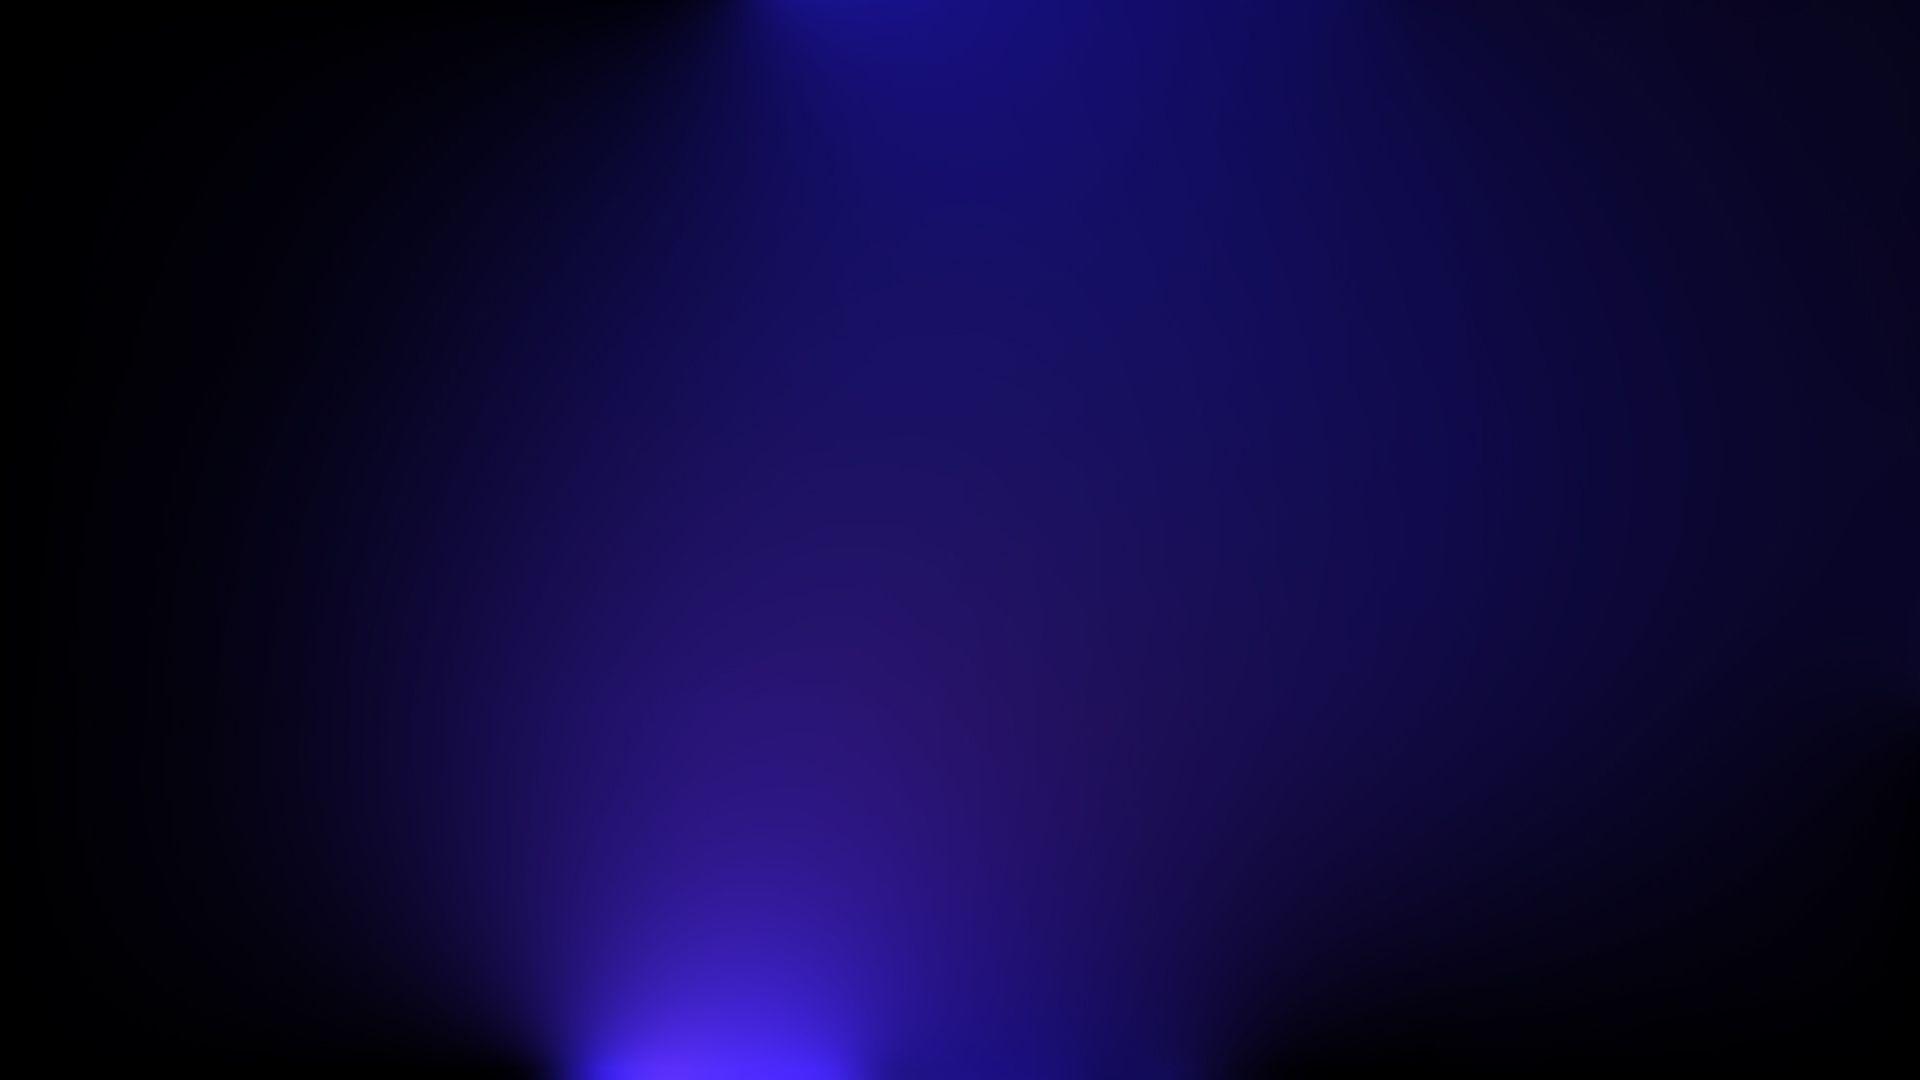 1920x1080 Dark Blue Wallpaper Image - Epic Wallpaperz